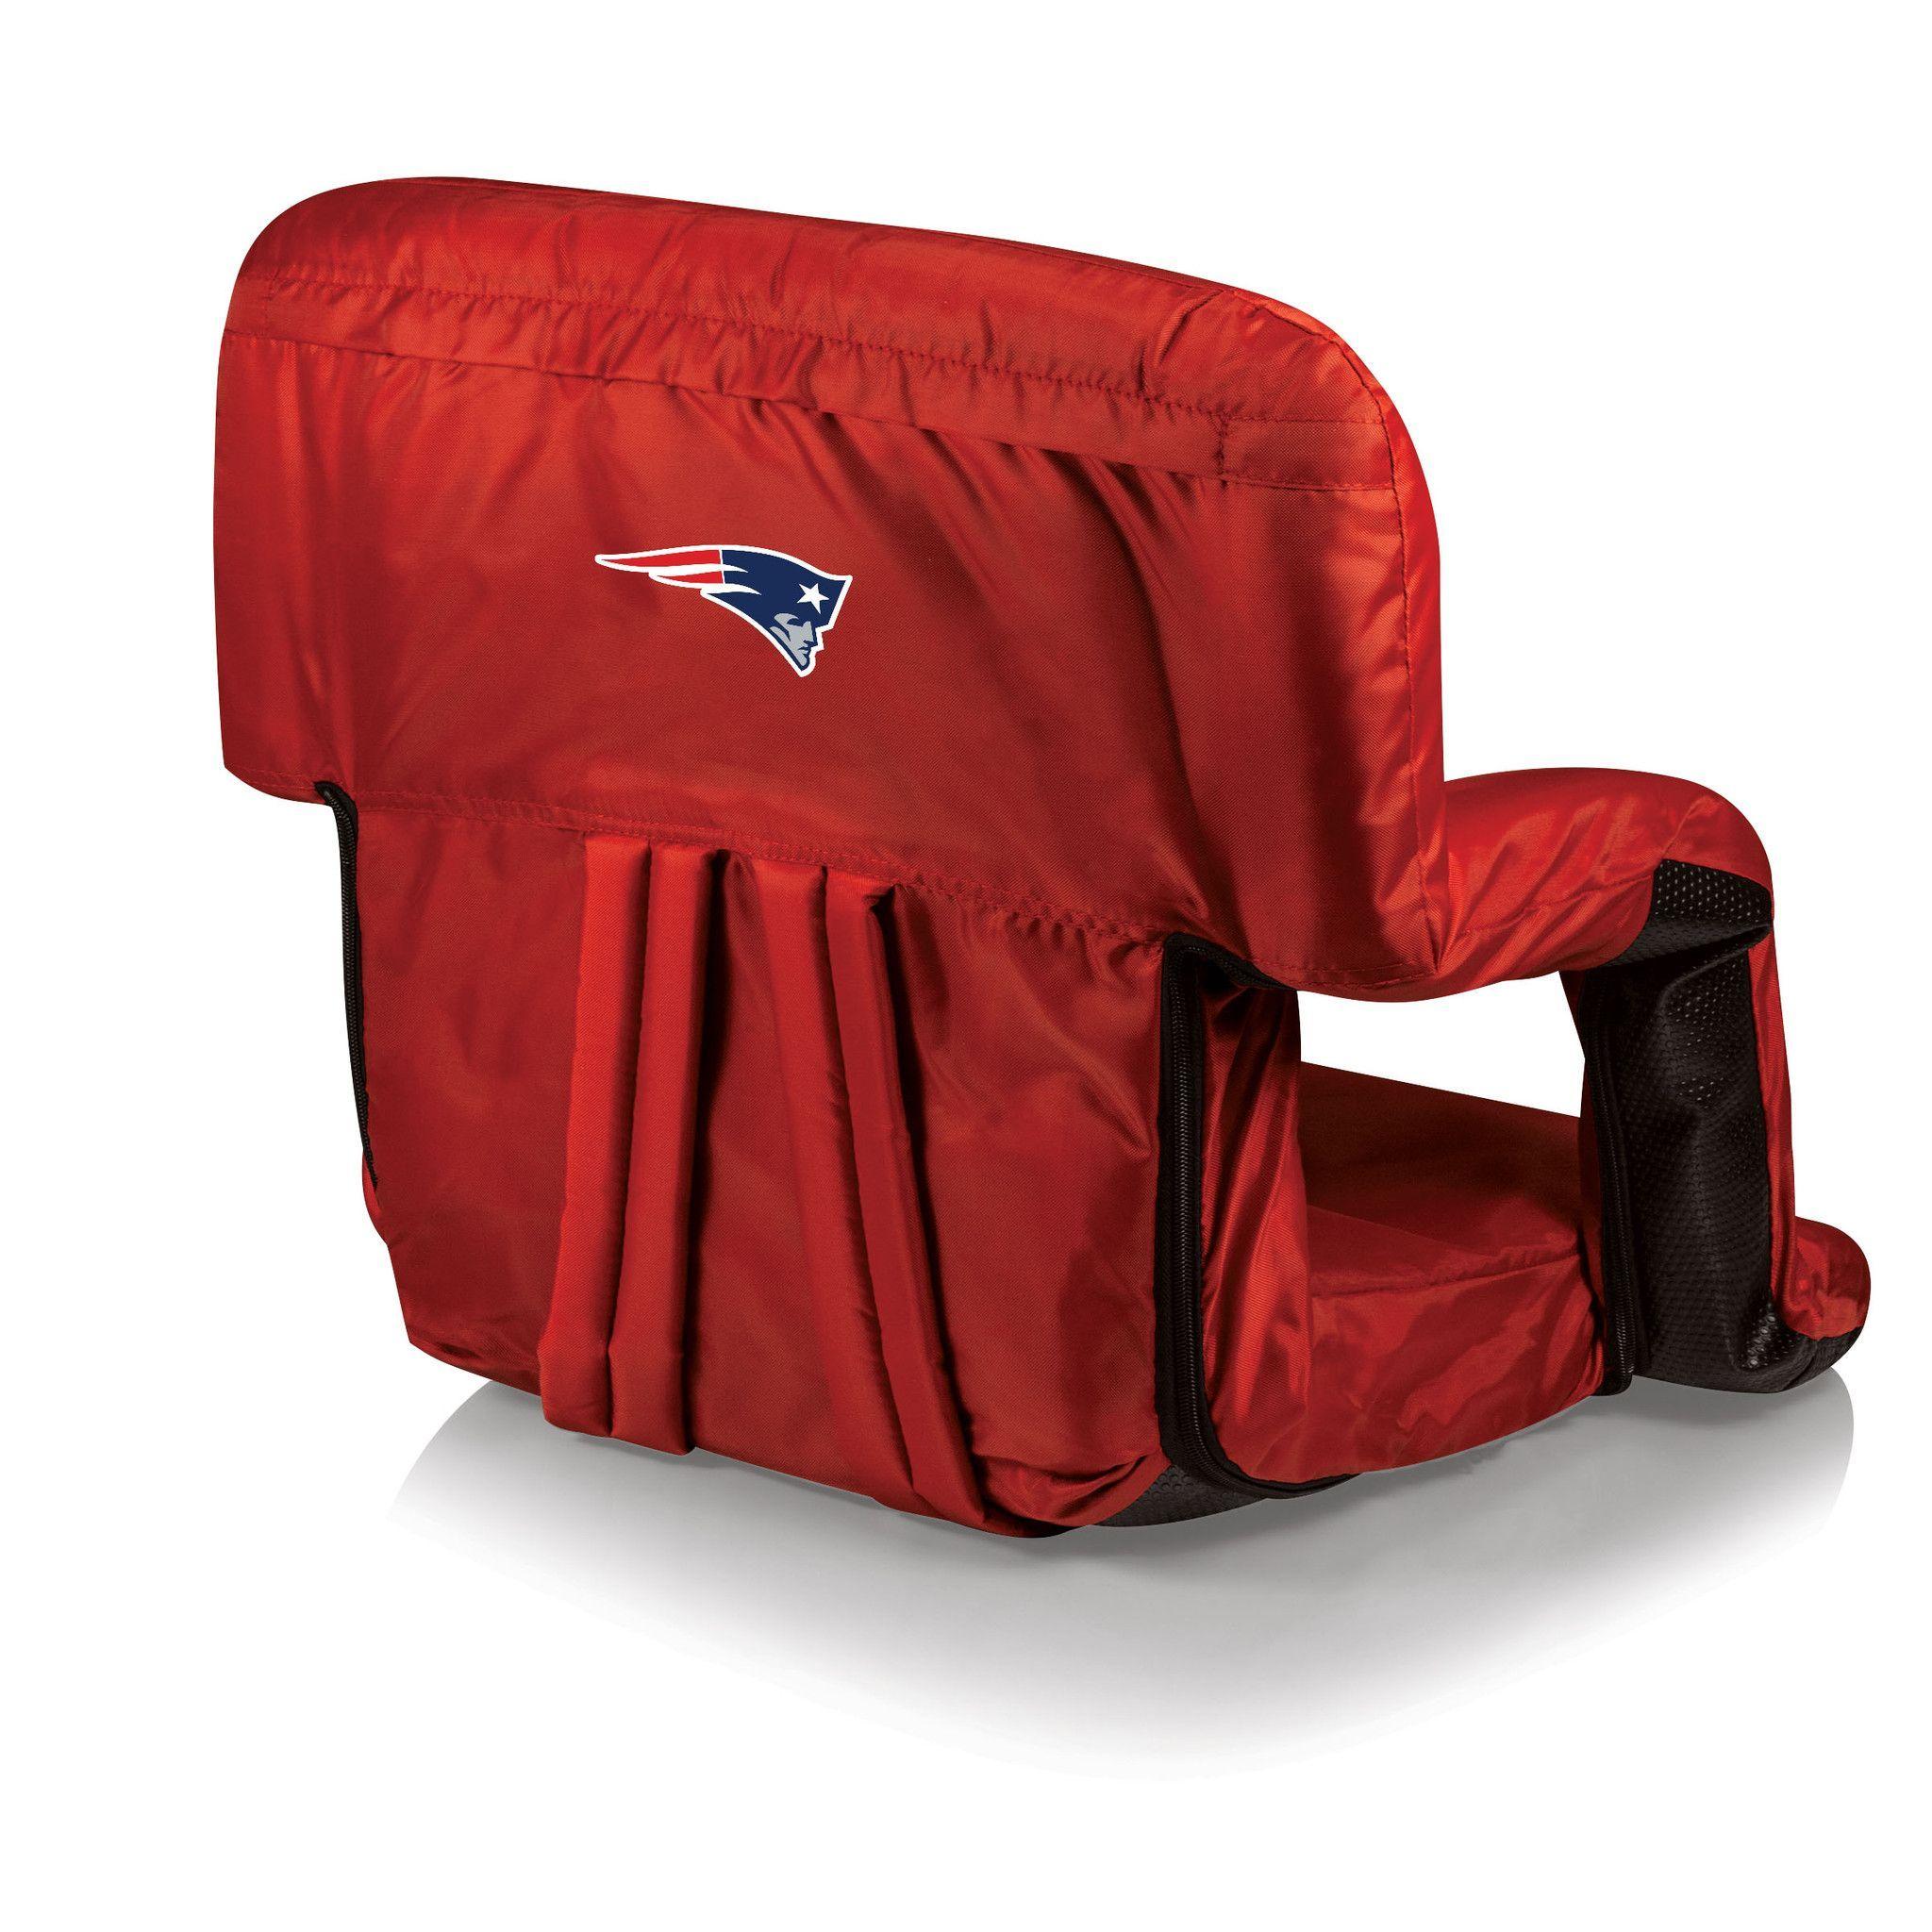 New England Patriots Ventura Seat